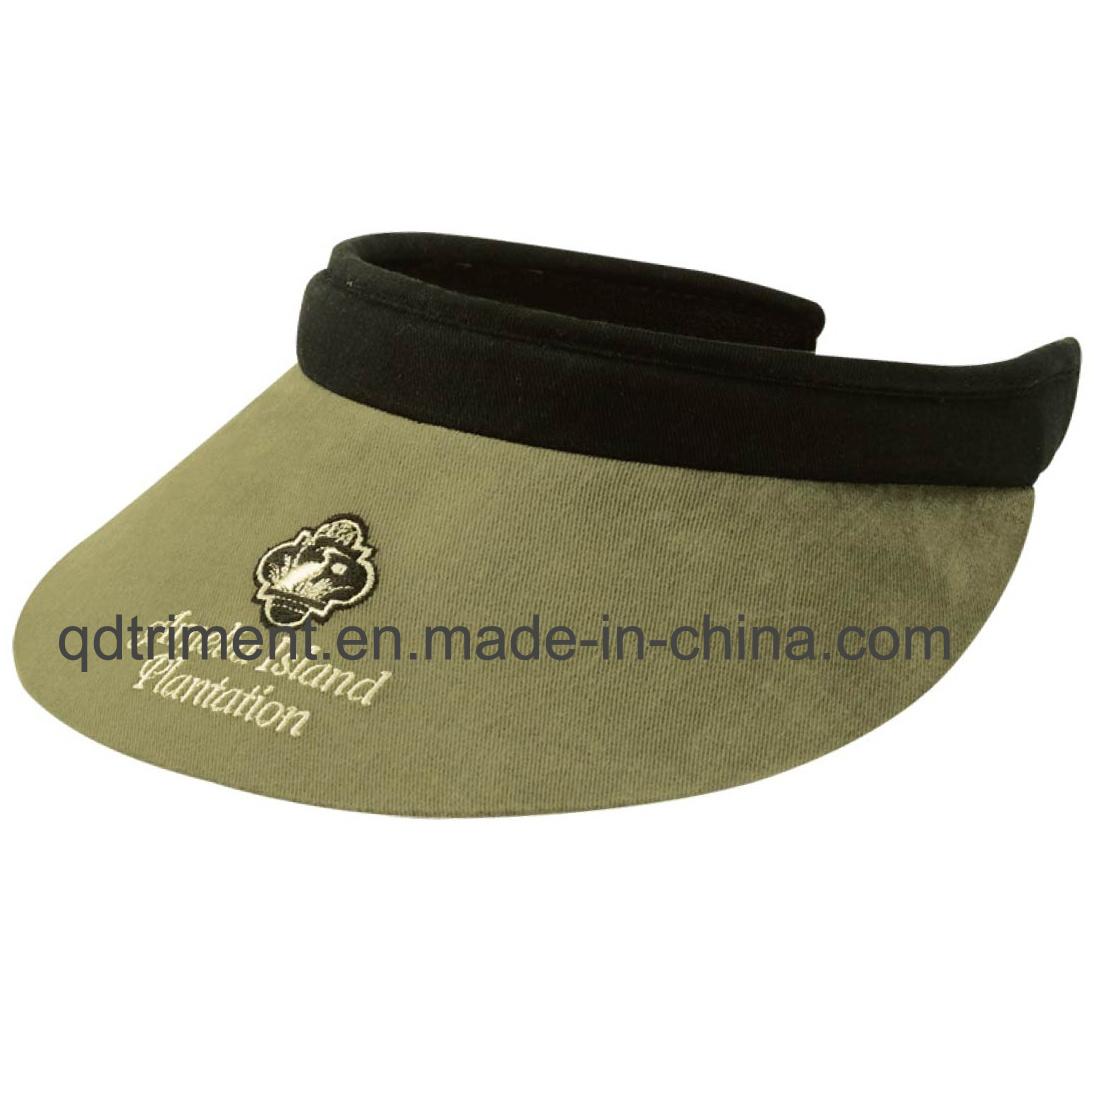 Comfortable Sweatband Long Bill Clip-on Custom Leisure Sun Visor (TRV015)